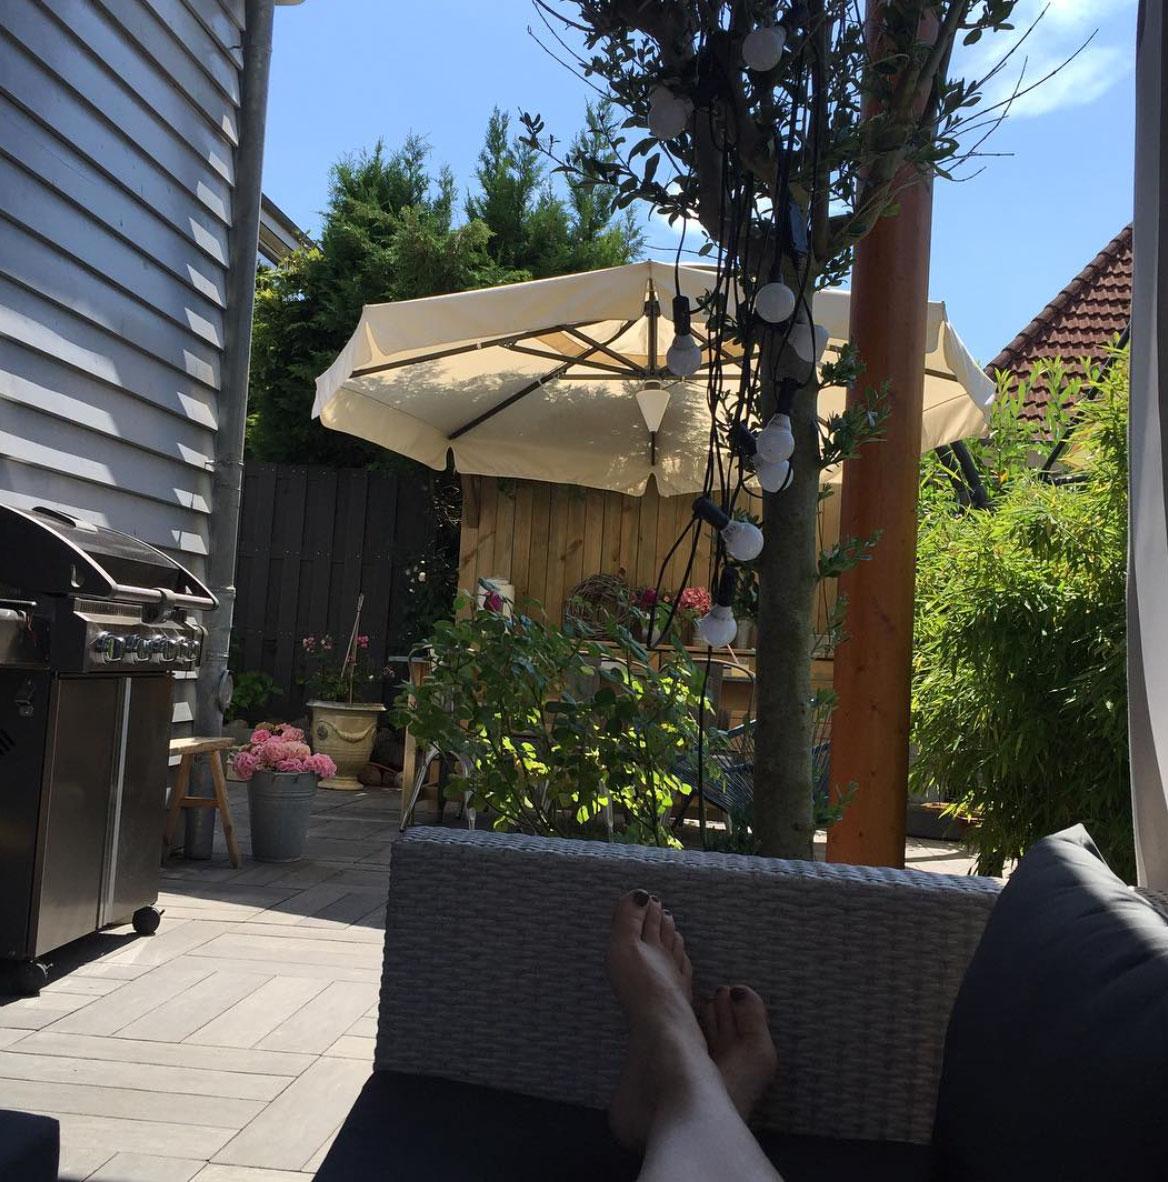 terrasse-gestalten-ideen